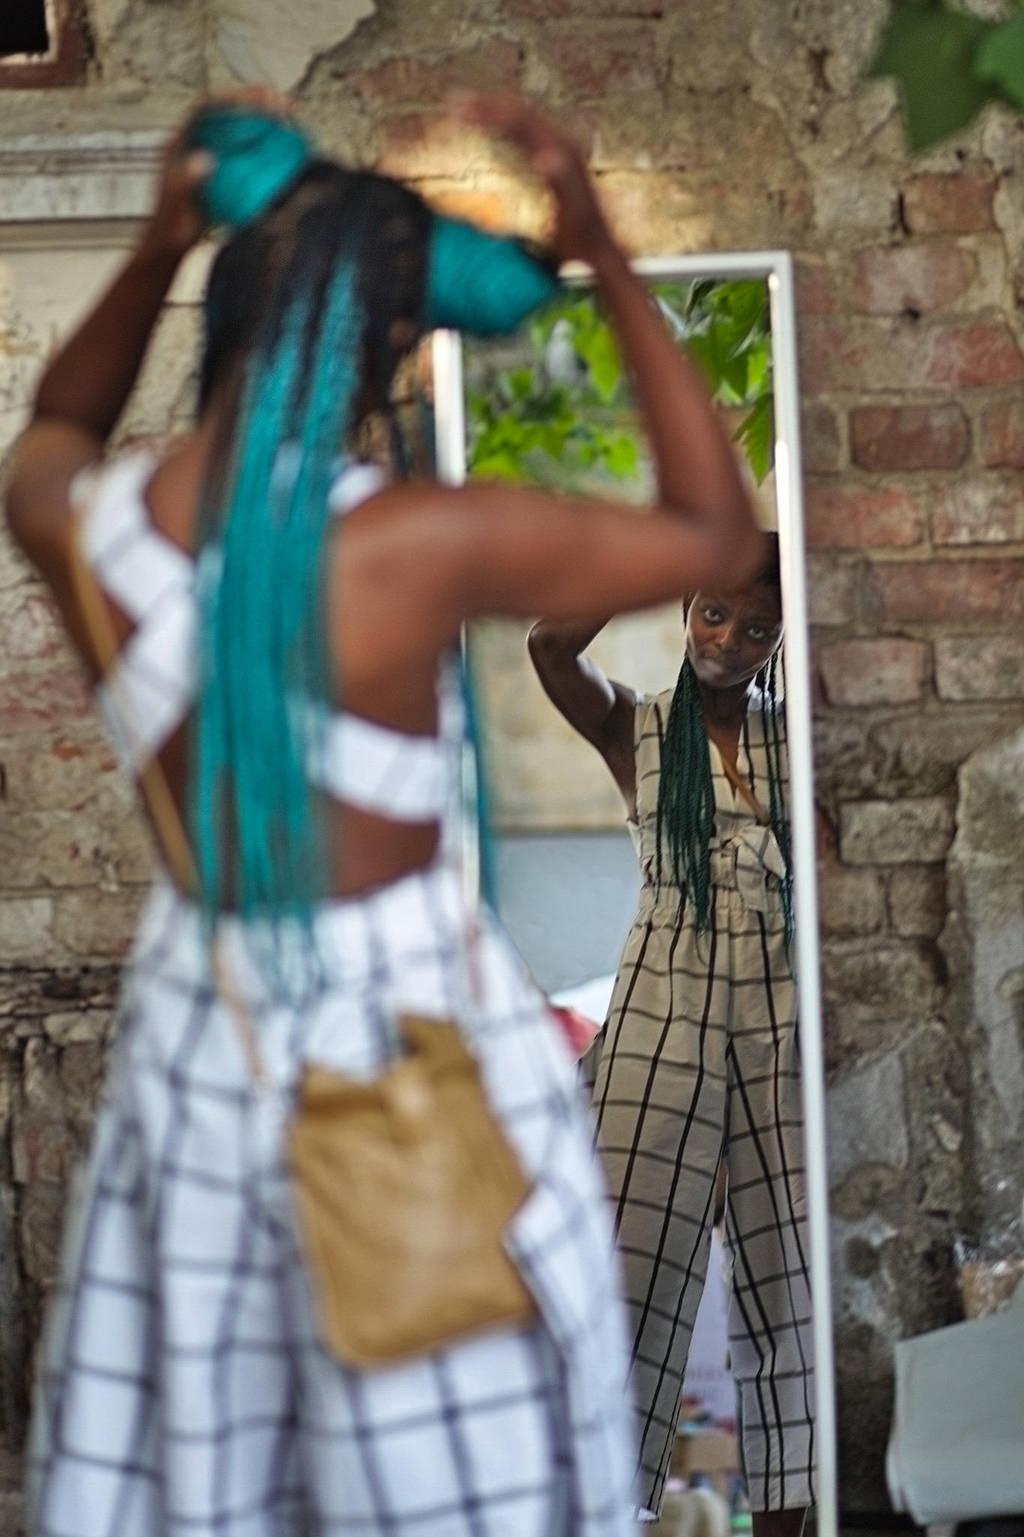 Face the mirror by nicubunu